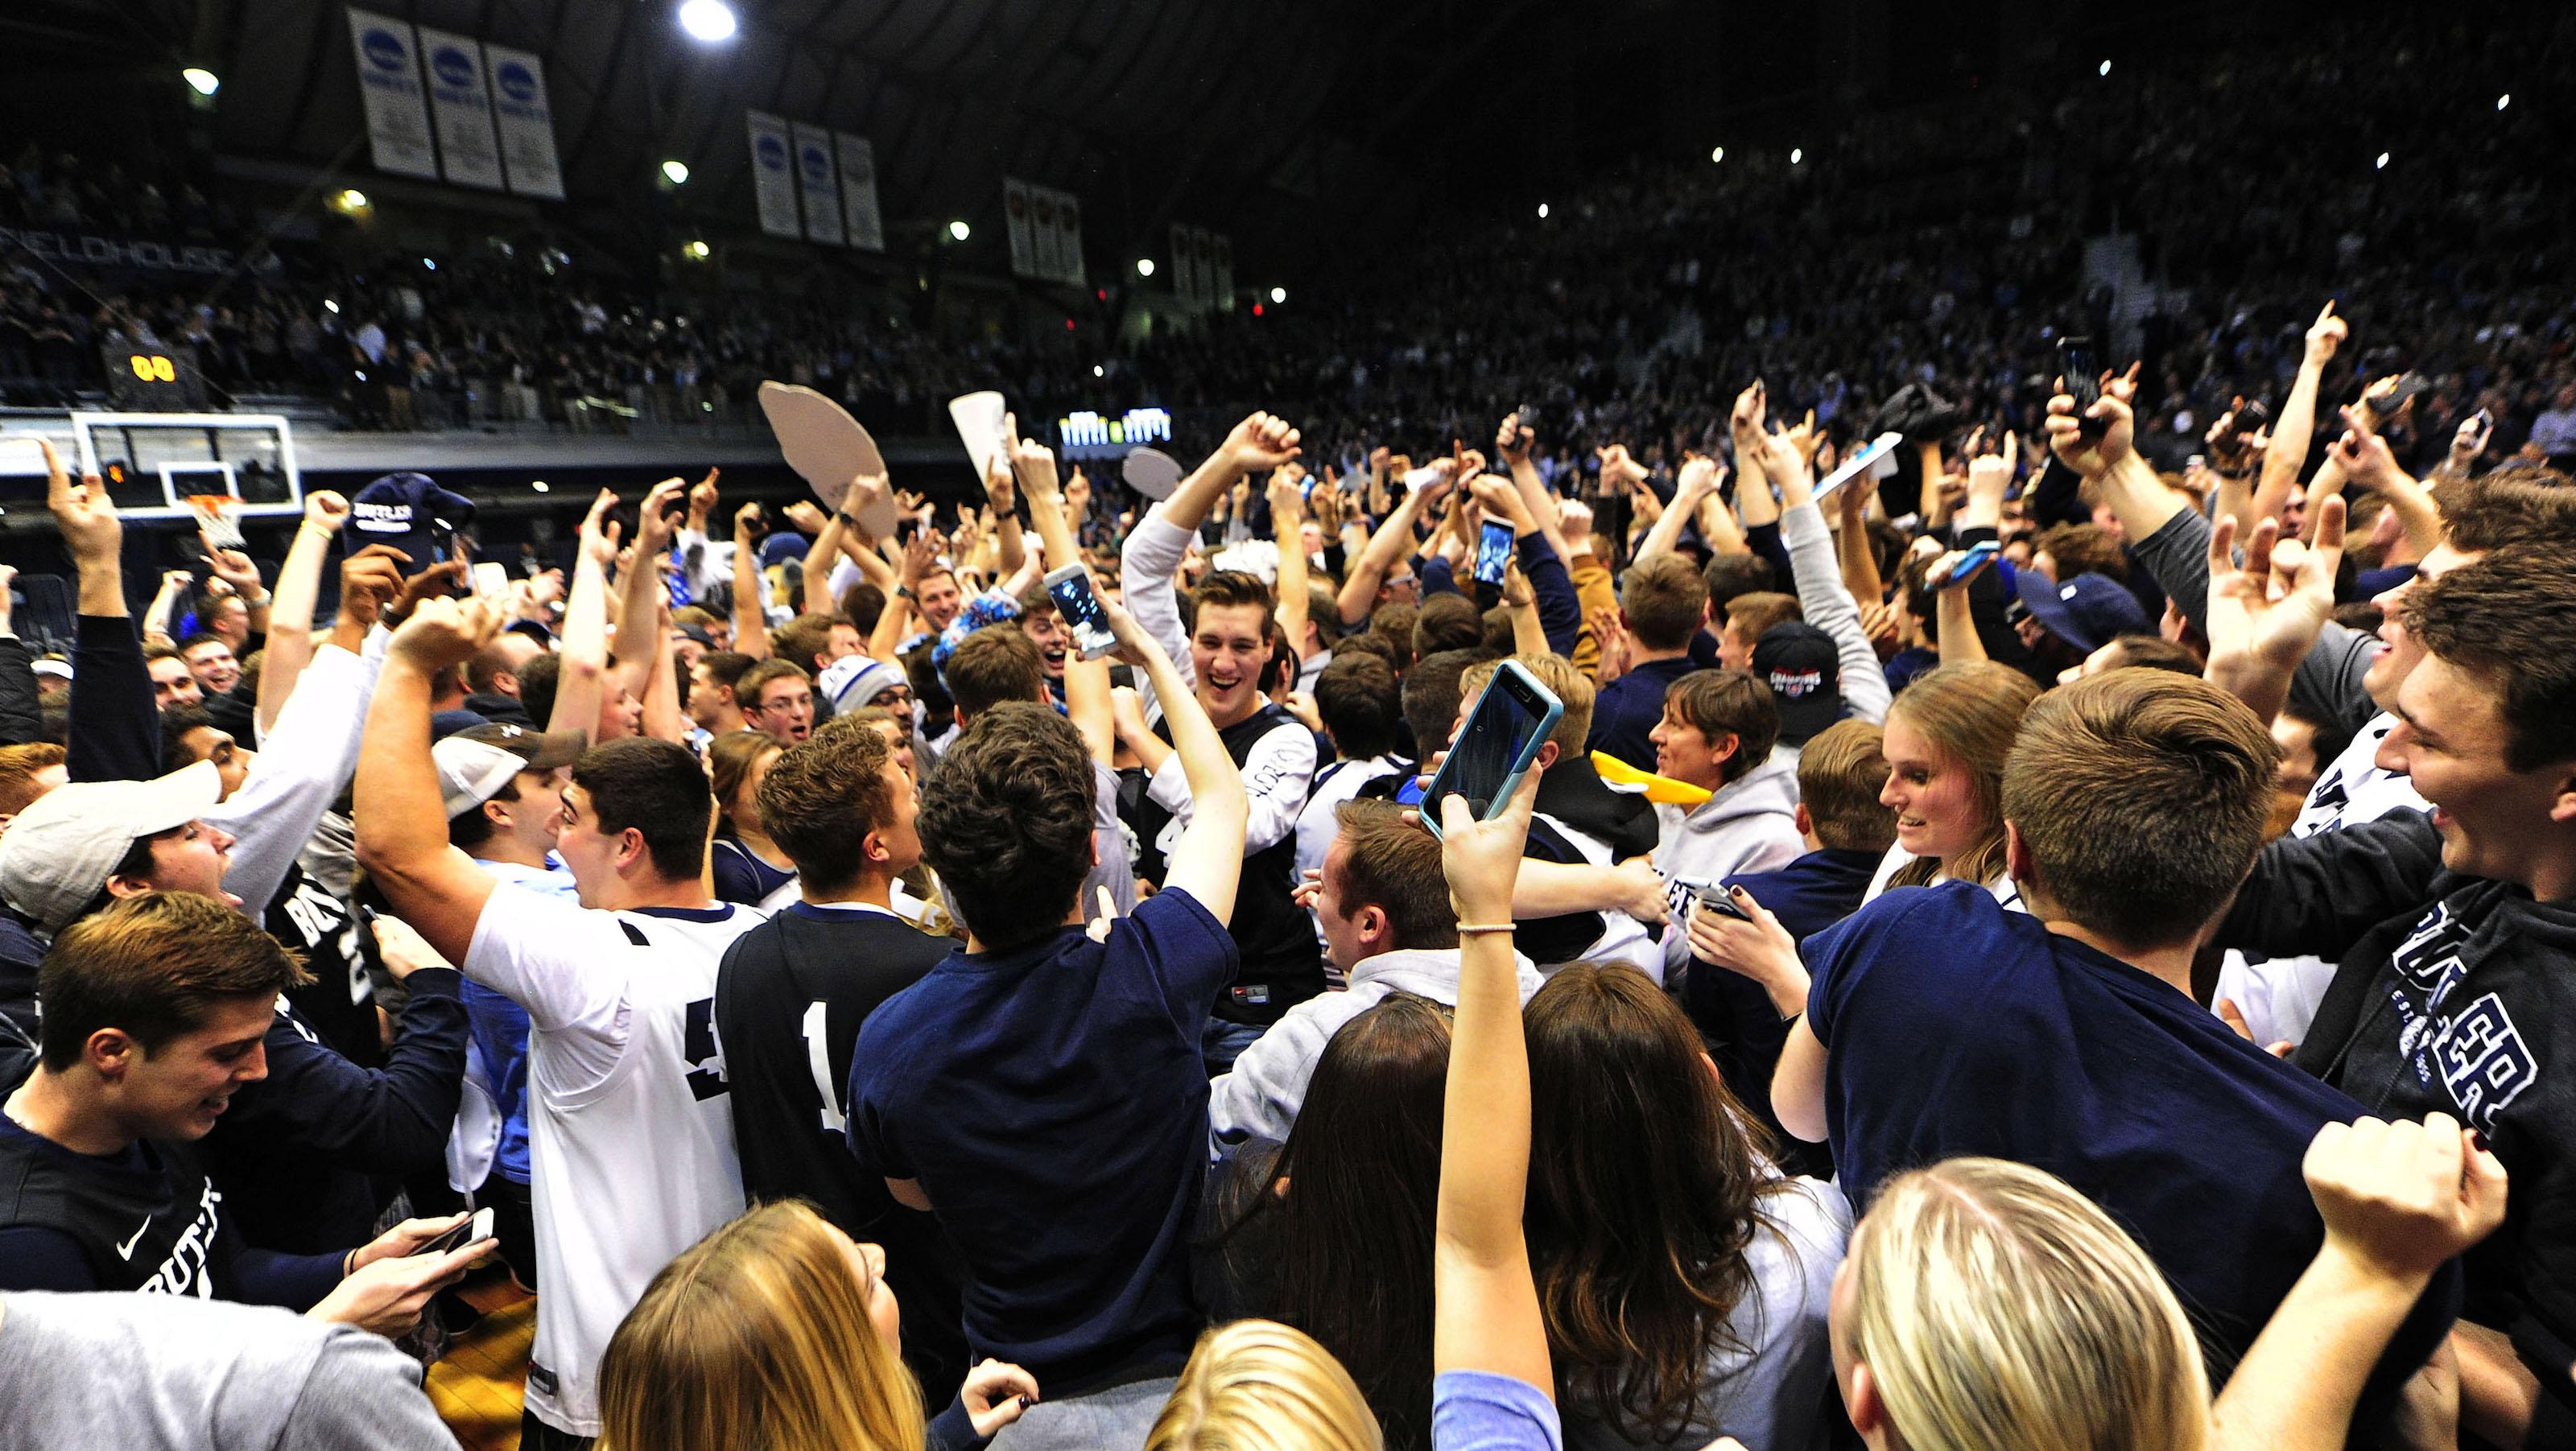 Jan 4, 2017; Indianapolis, IN, USA;  Butler University students celebrate moments after defeating Villanova University 66-58 at Hinkle Fieldhouse. Mandatory Credit: Thomas J. Russo-USA TODAY Sports - RTX2XKUA